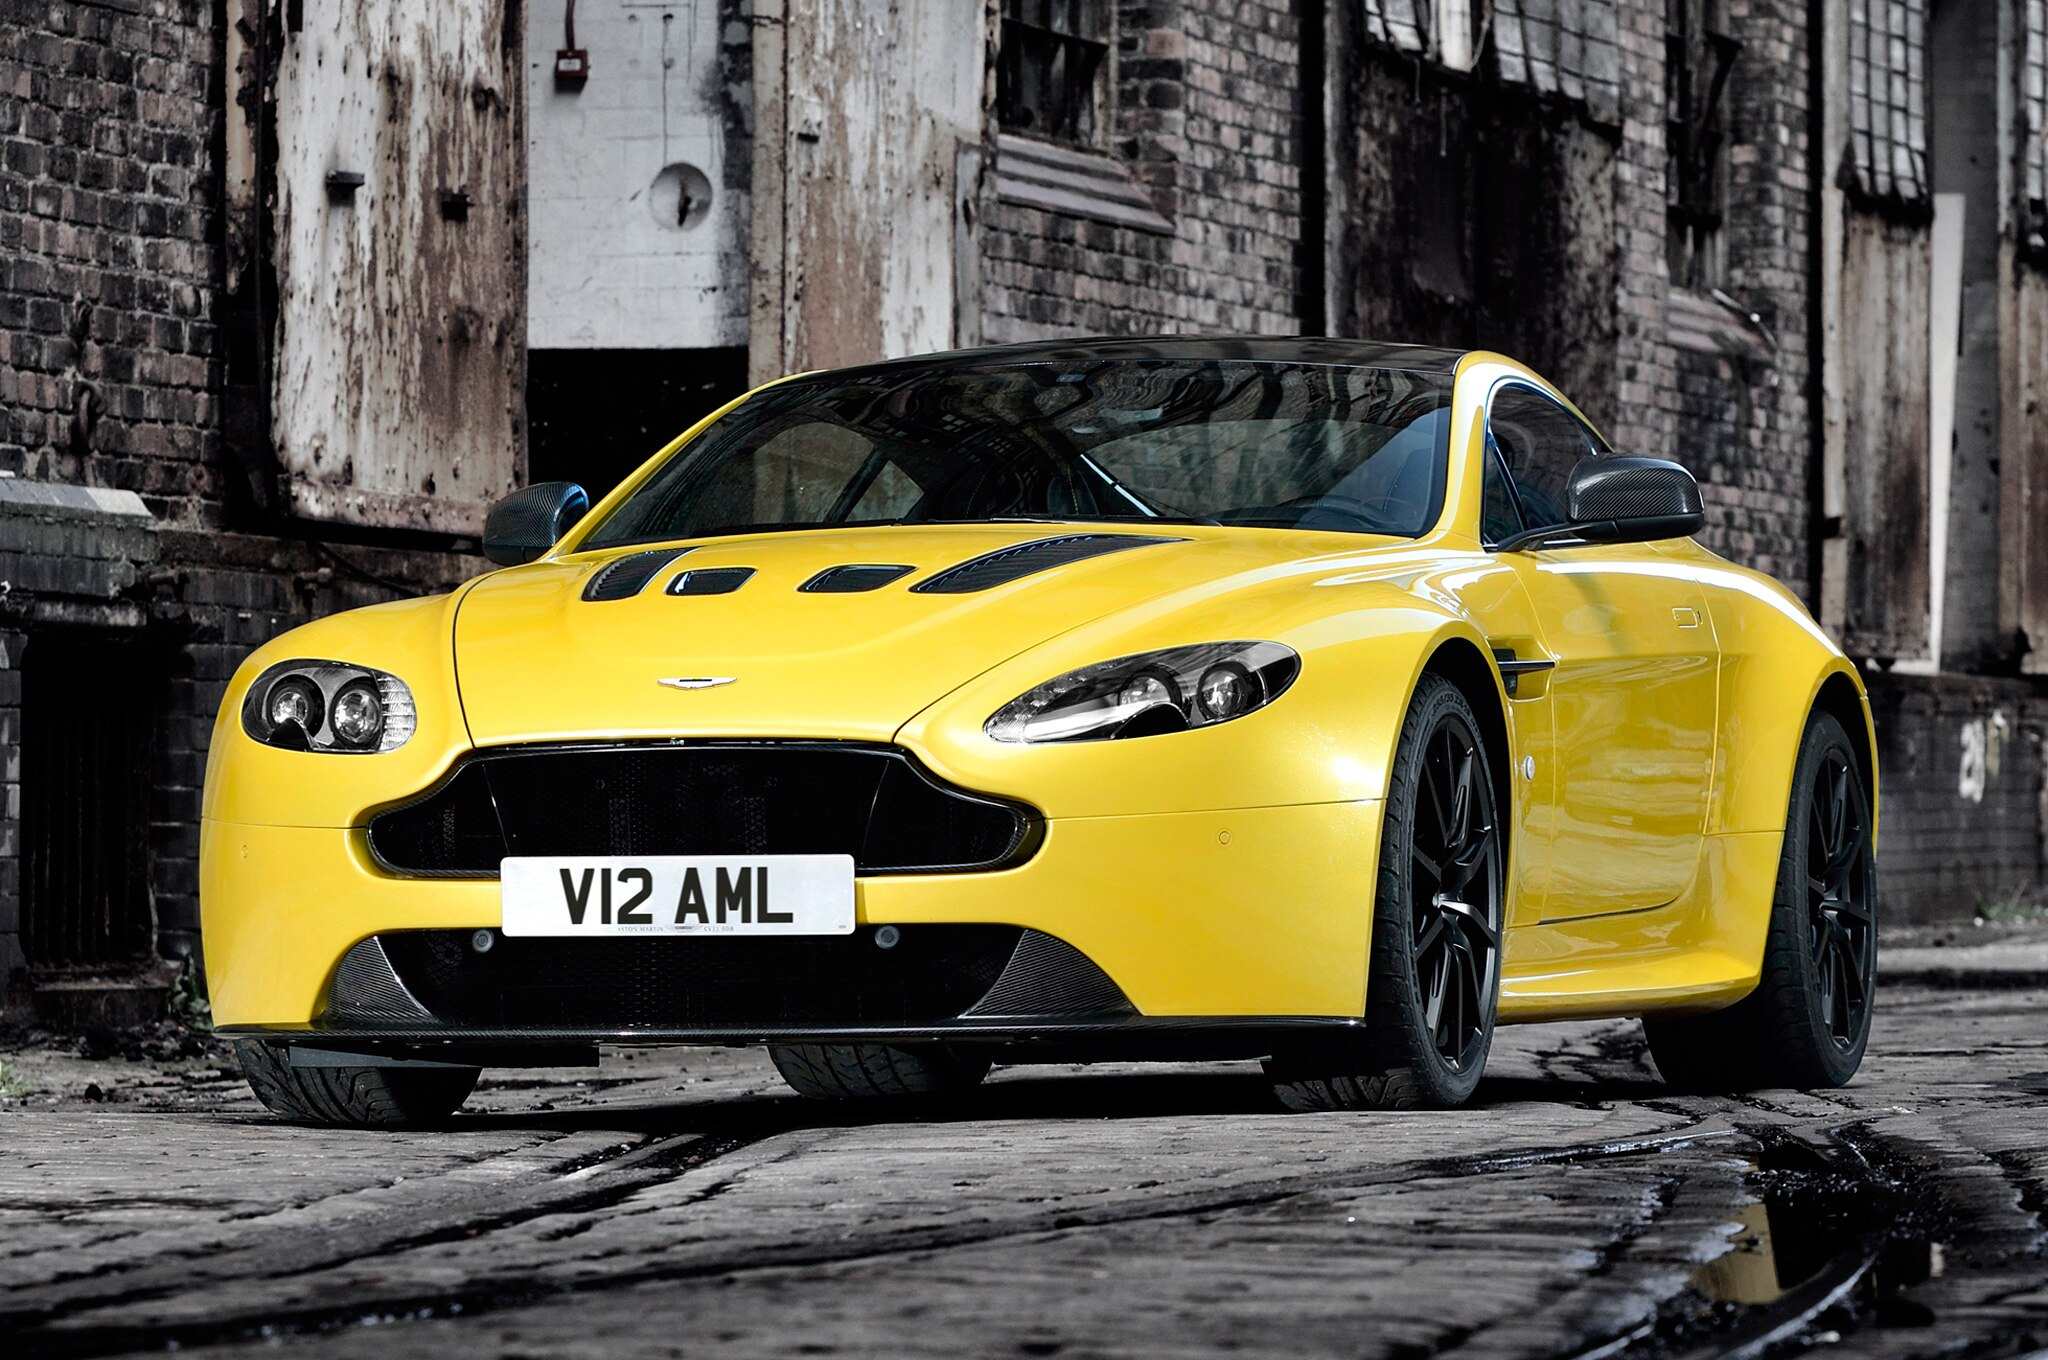 2015 Aston Martin V12 Vantage S Unveiled